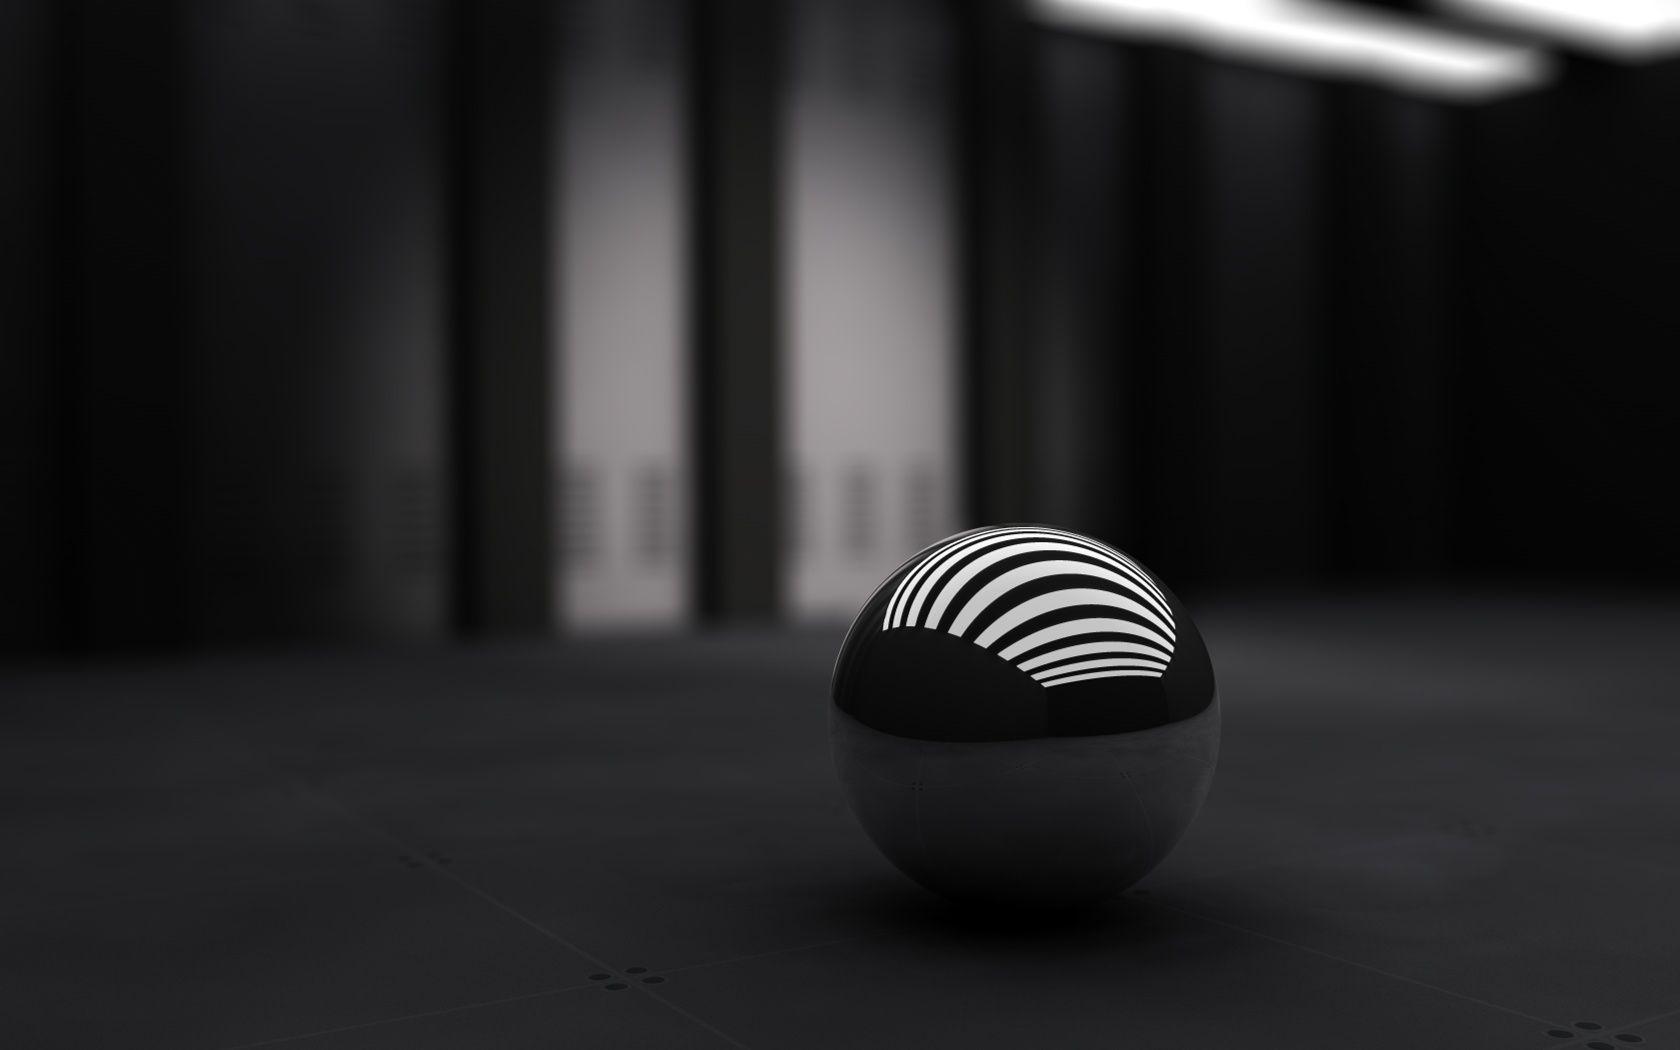 3d Black Ball Wallpaper Hd Black Wallpaper Dark Wallpaper Cool Black Wallpaper